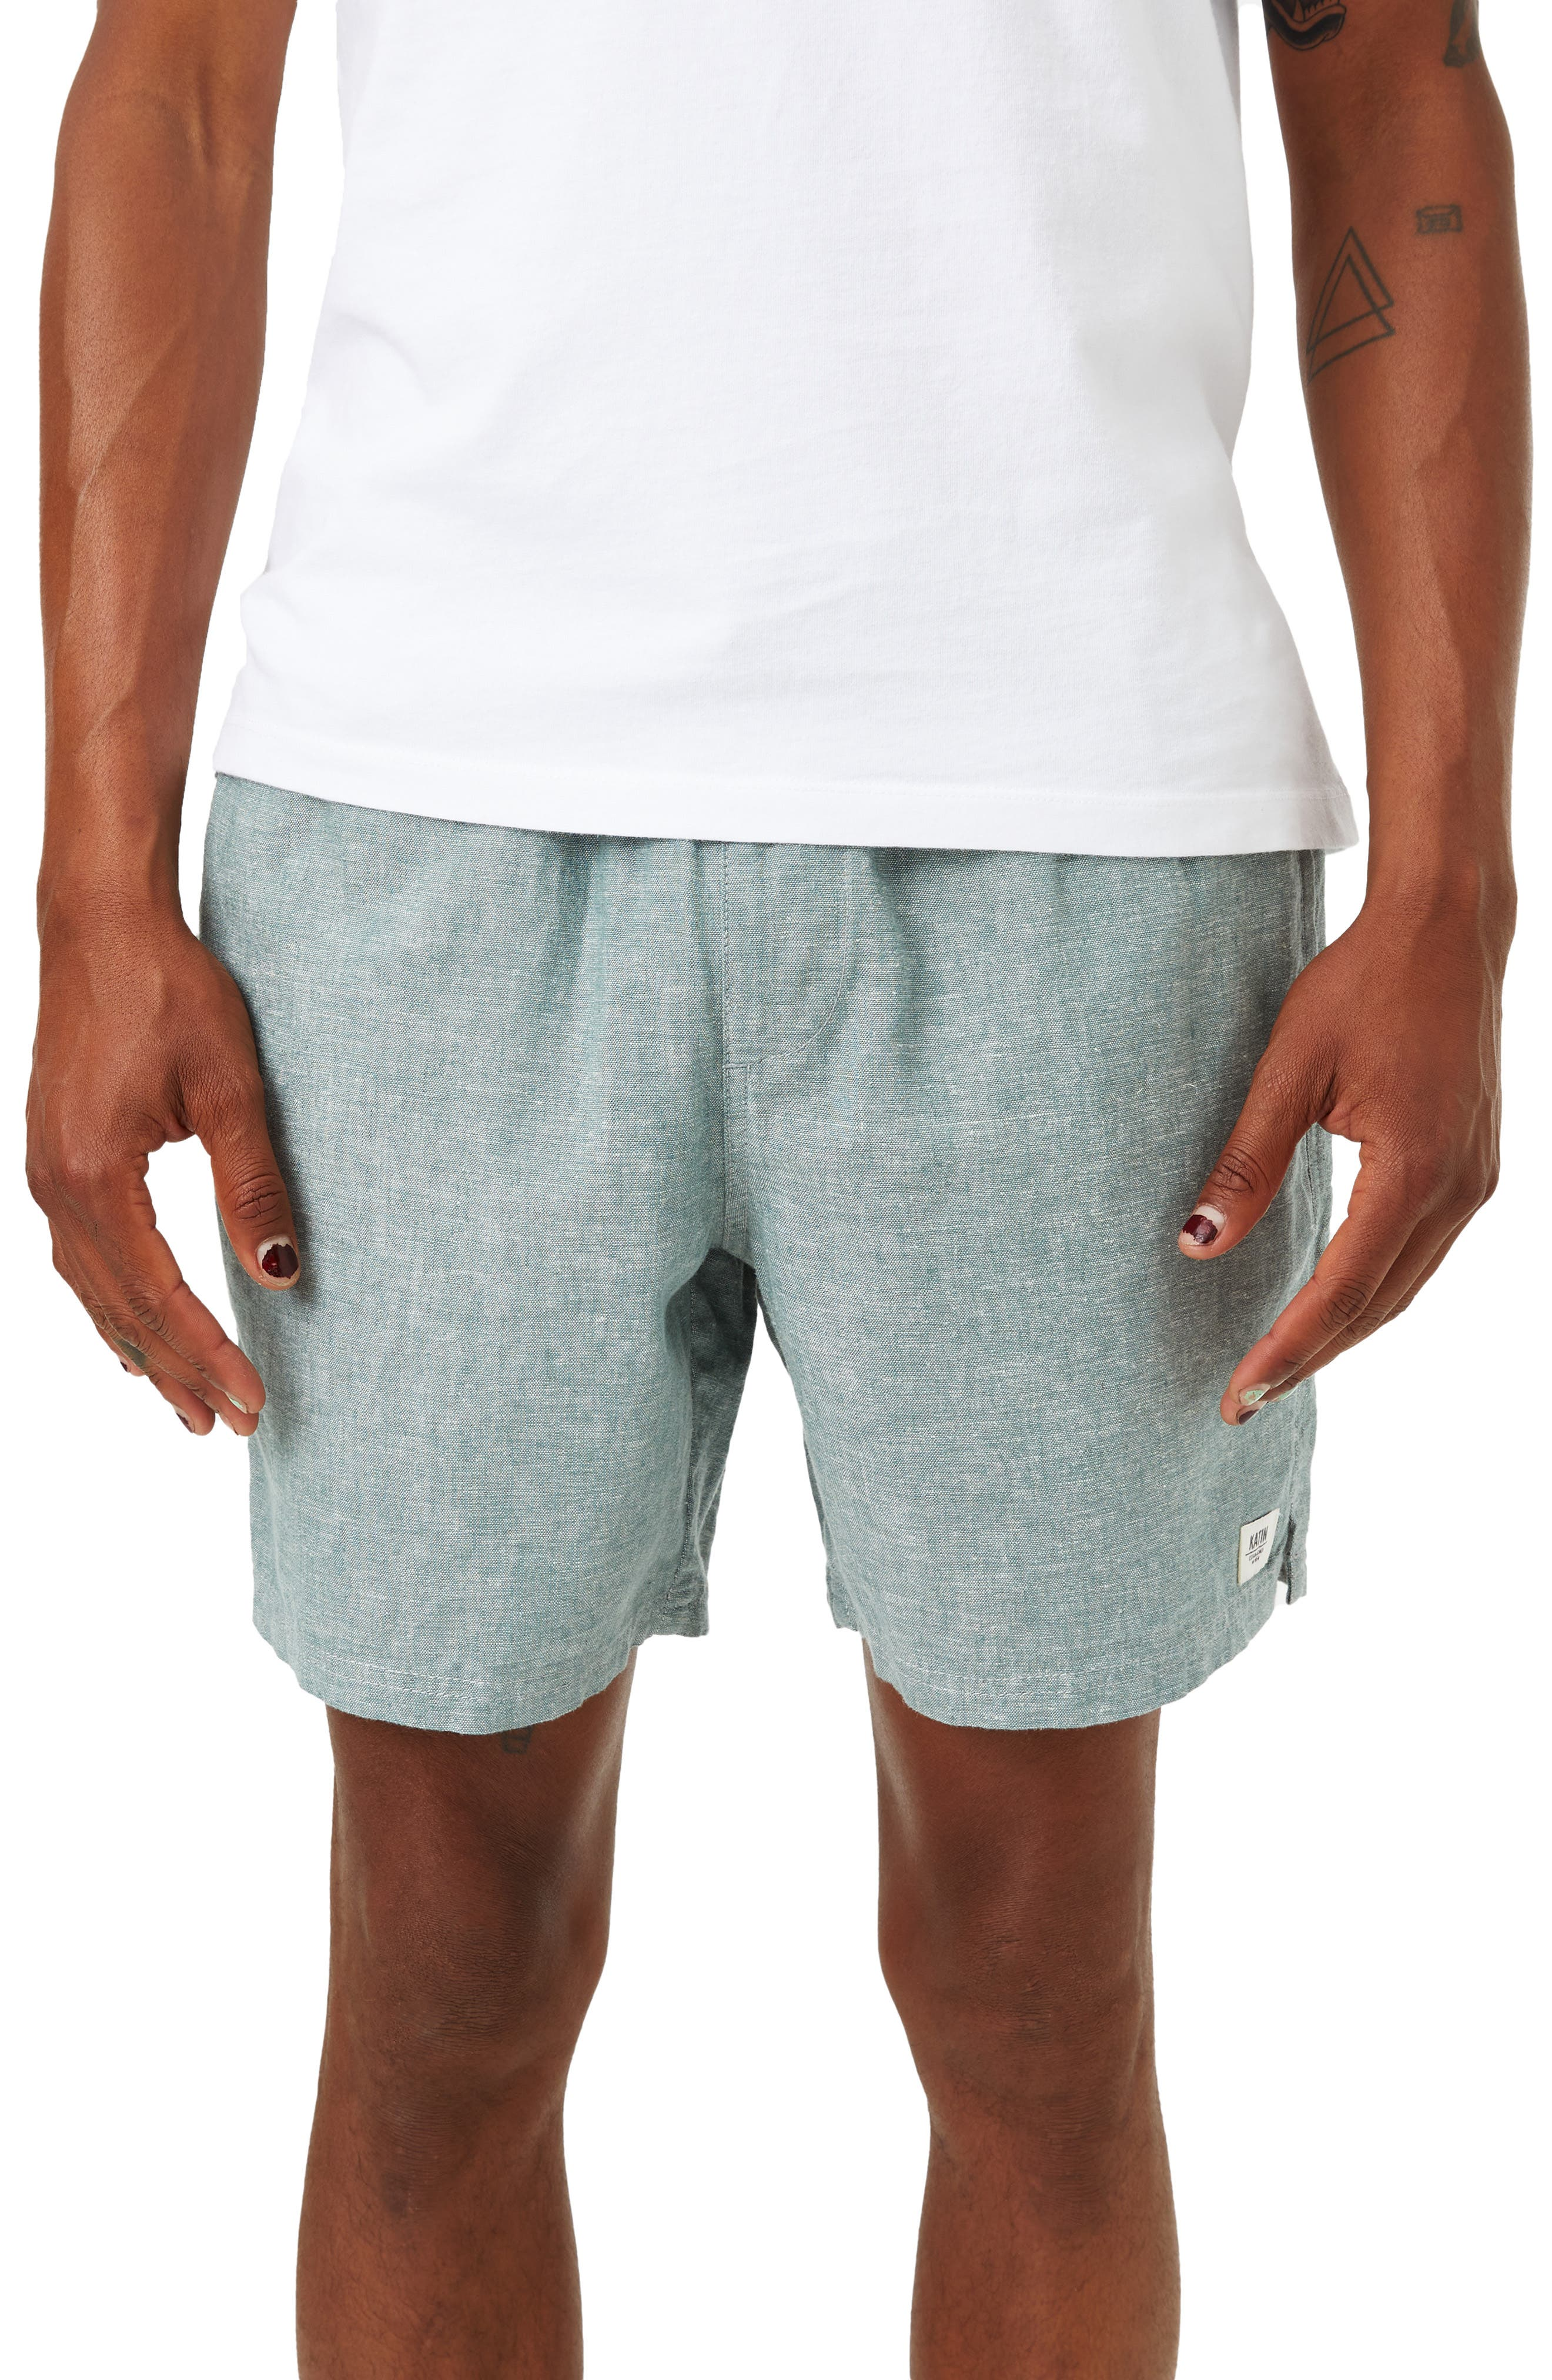 Isaiah Walkshort Cotton & Linen Shorts